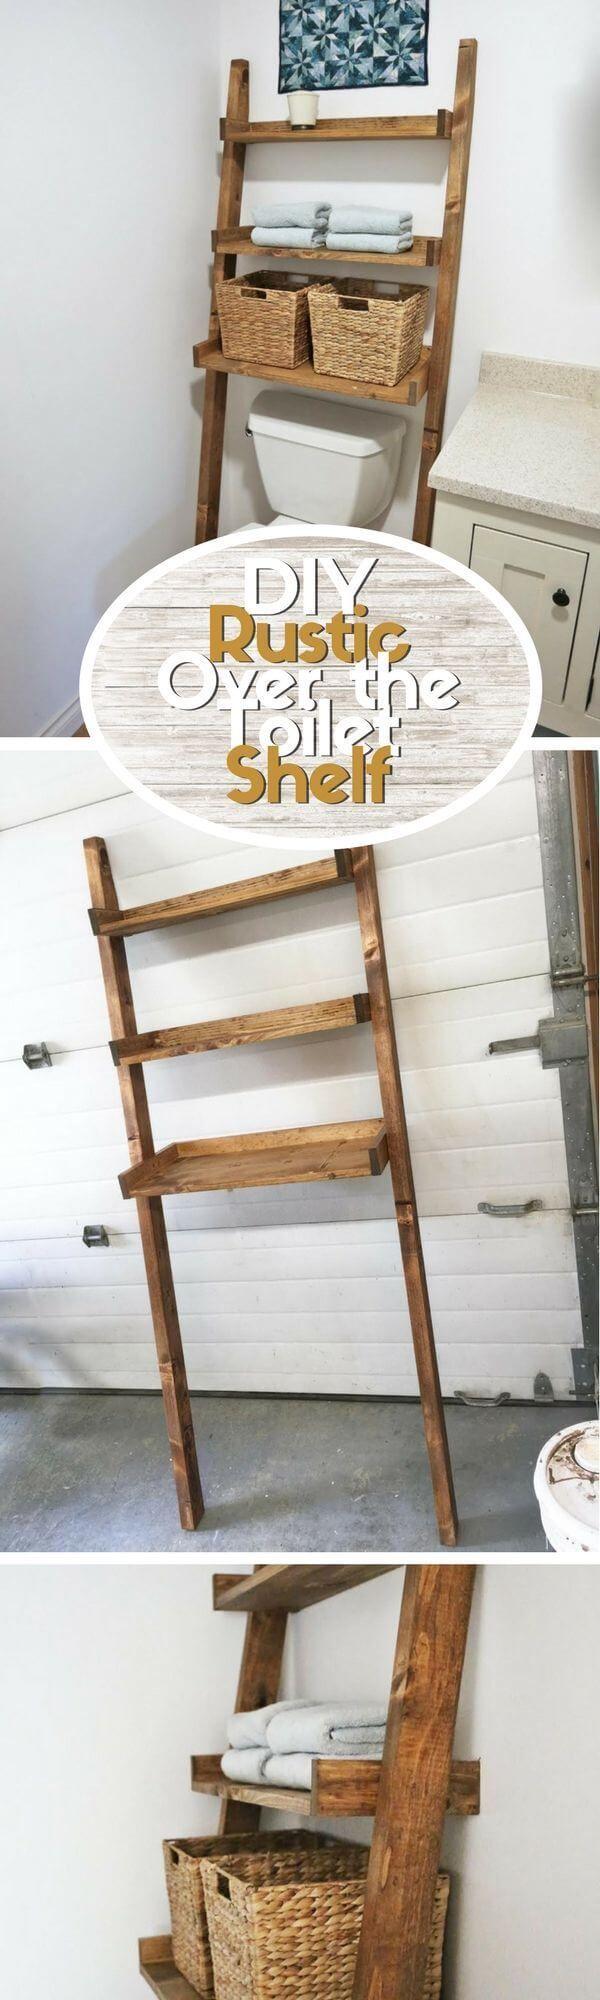 DIY Pallet Over-The-Toilet Shelf   Toilet shelves, Pallet diy